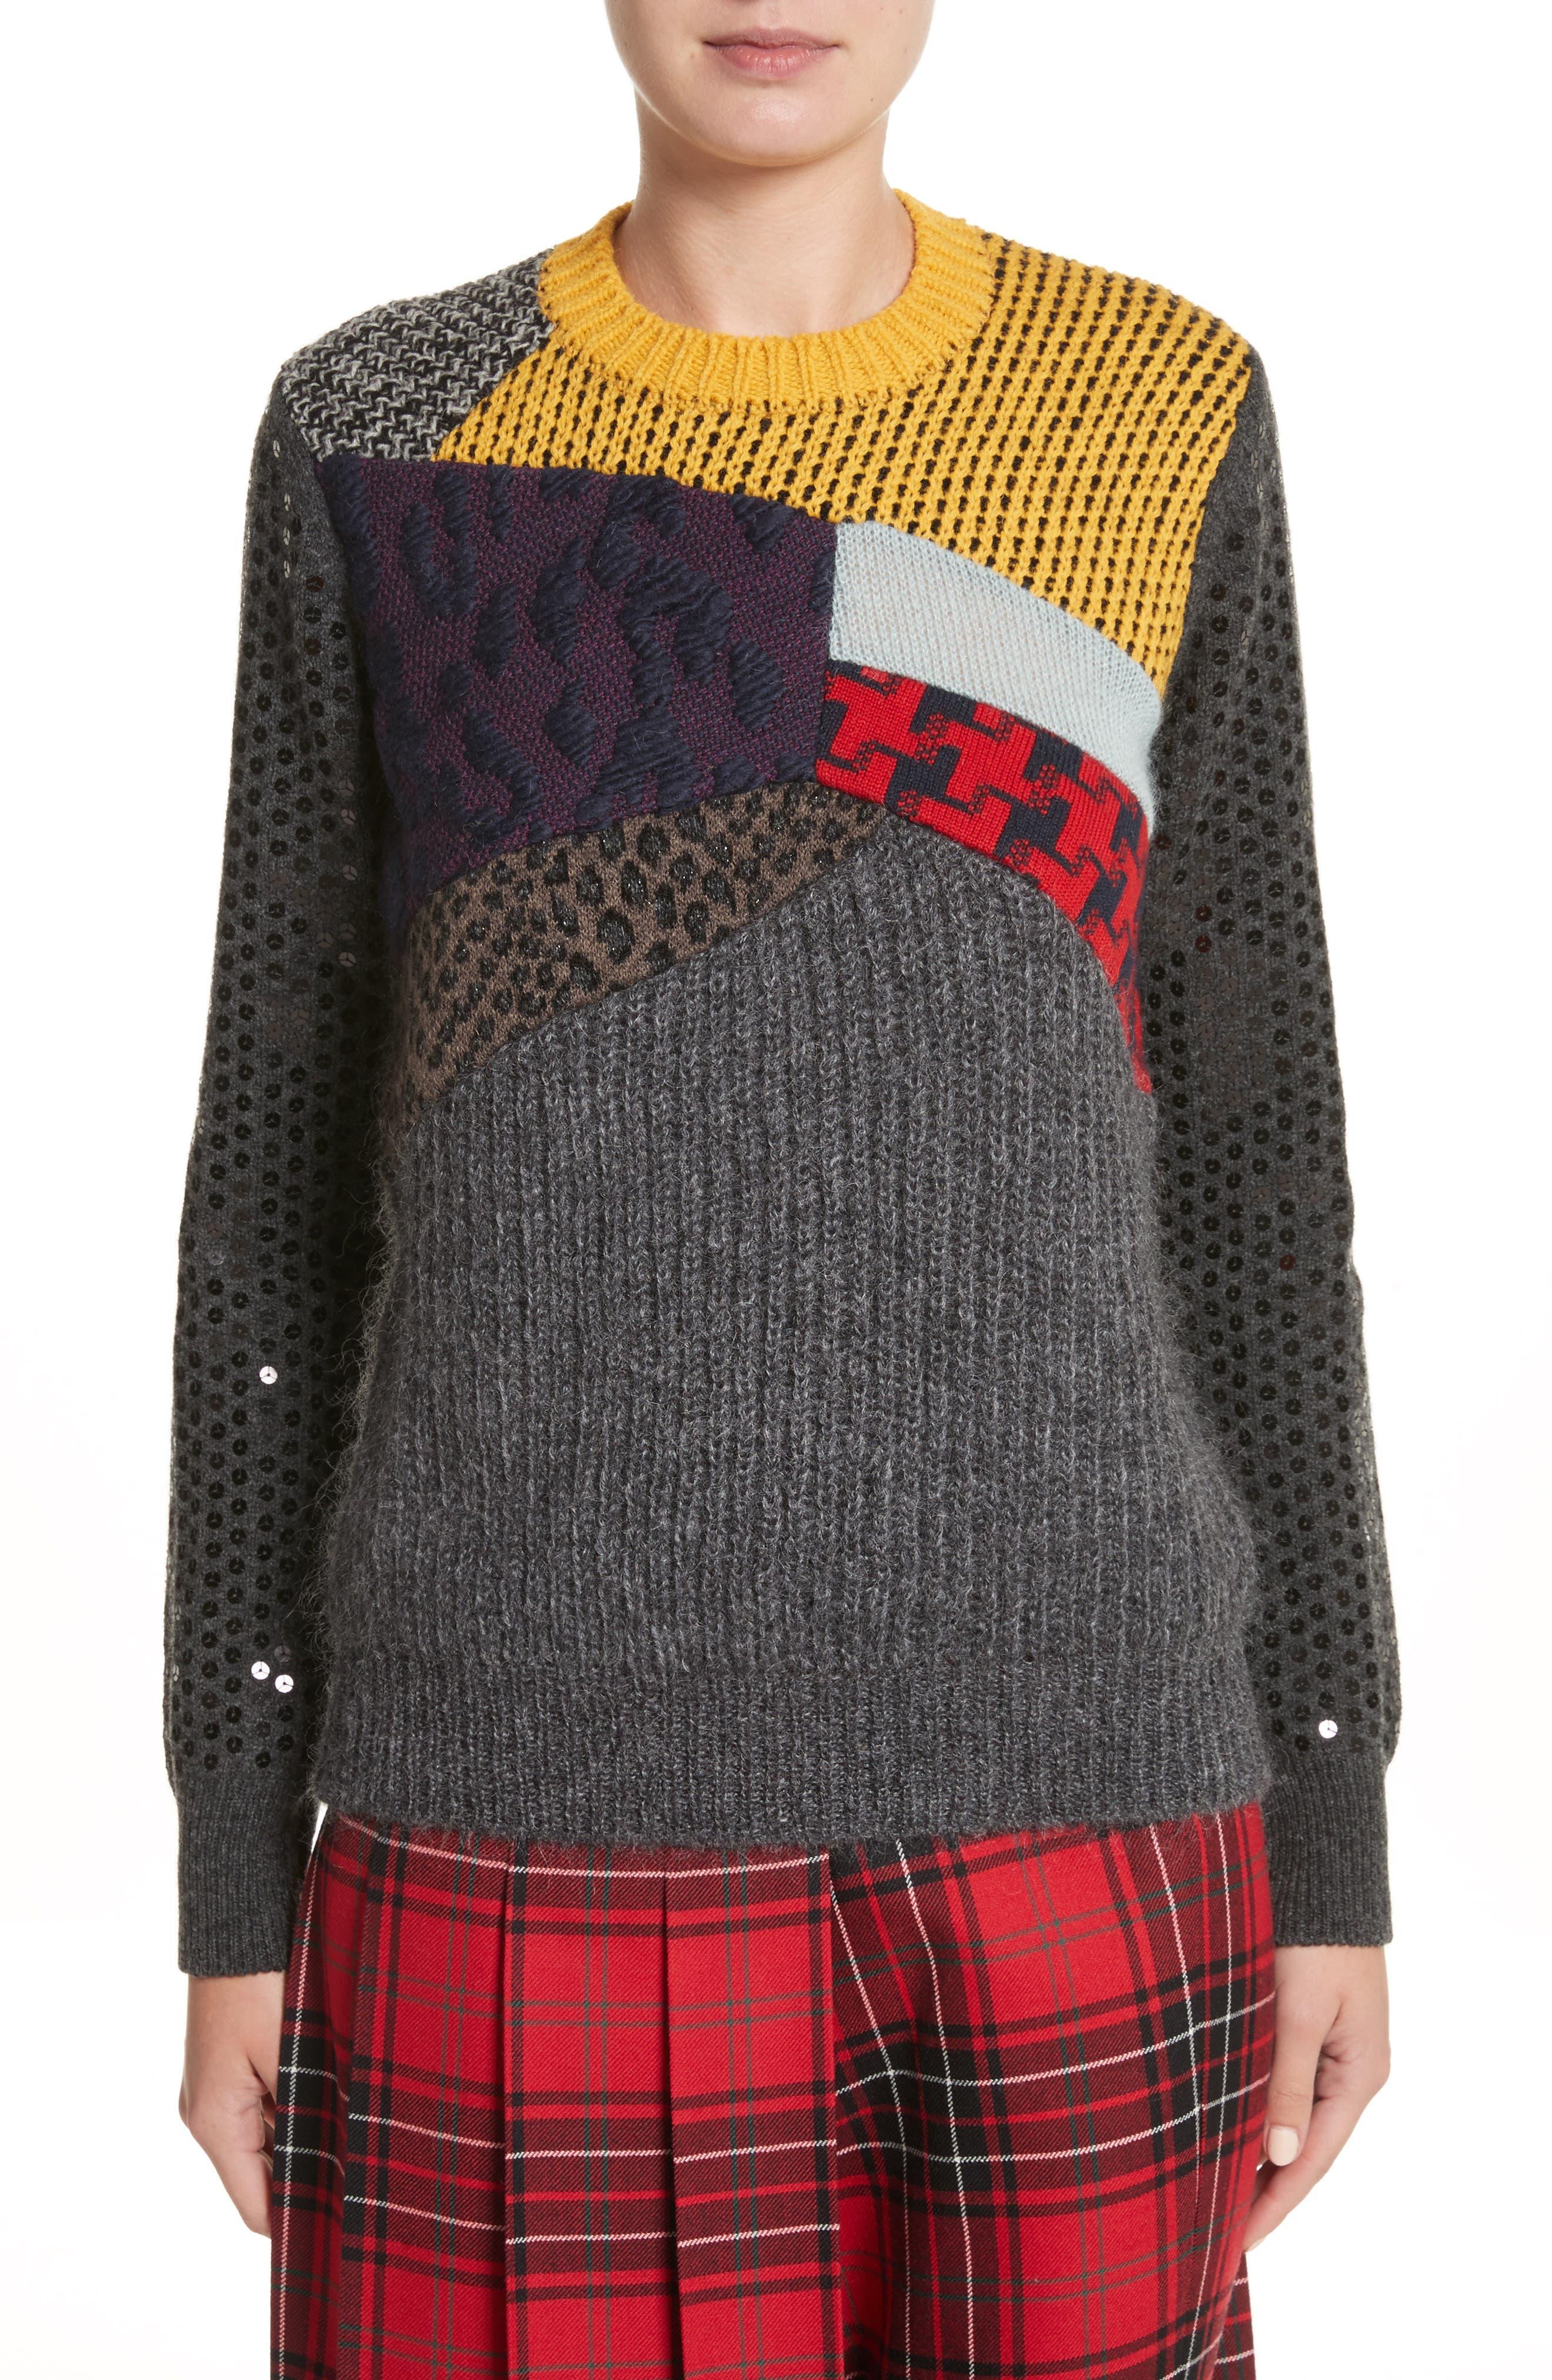 Junya Watanabe Mixed Media Sweater